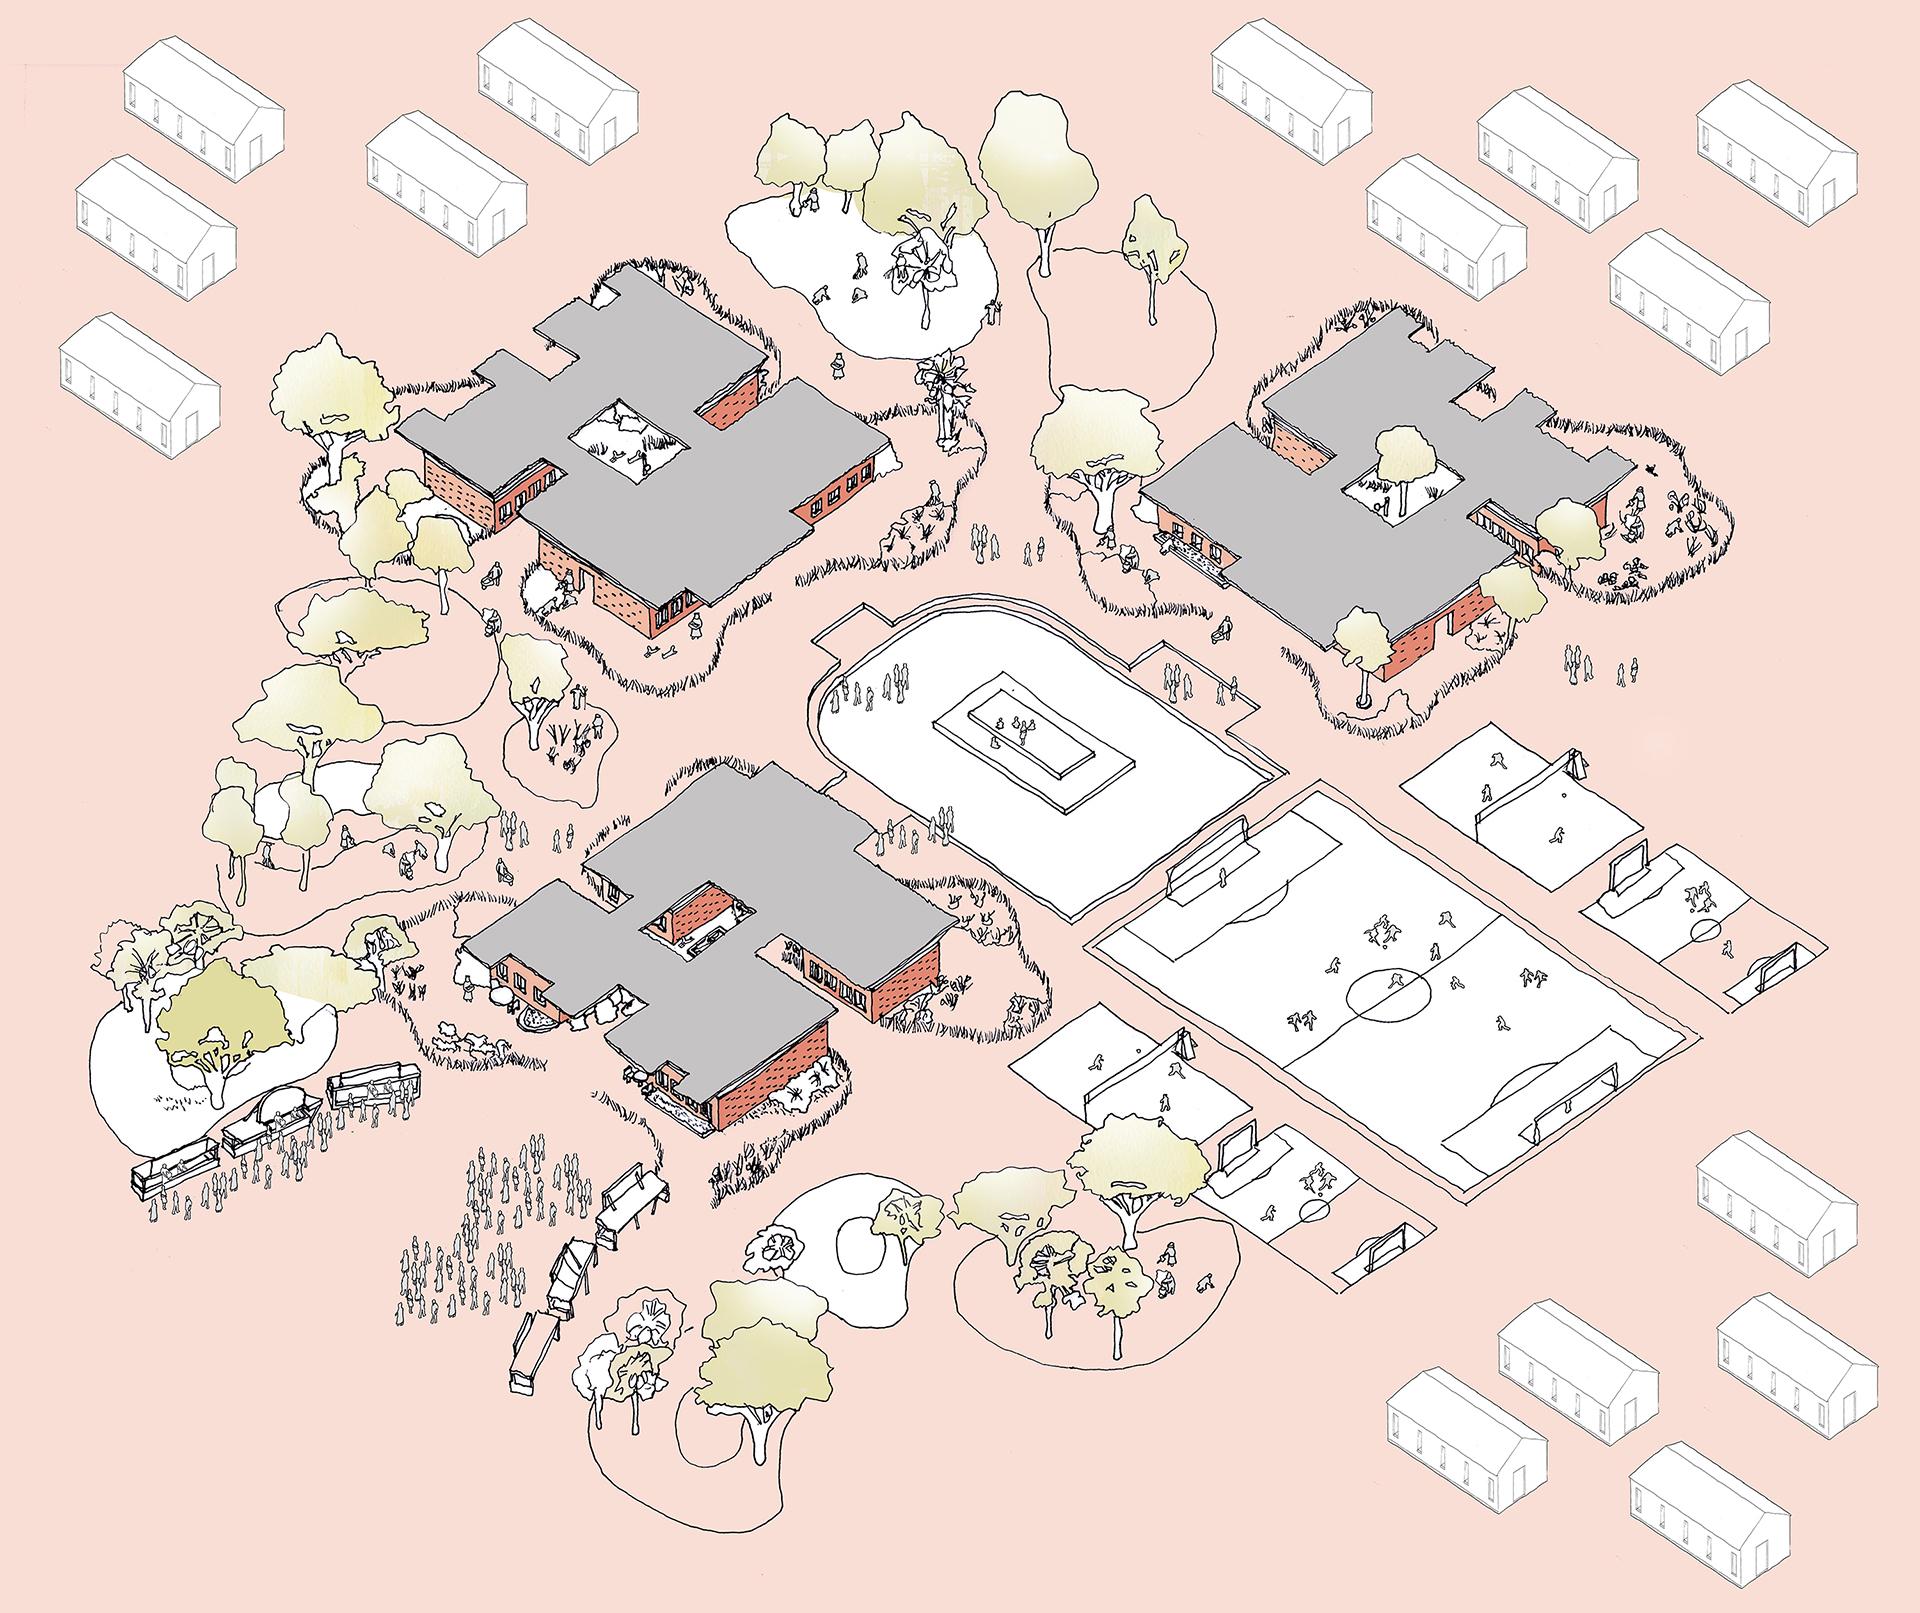 15 year plan Axonometric sketch of Modular School Concept